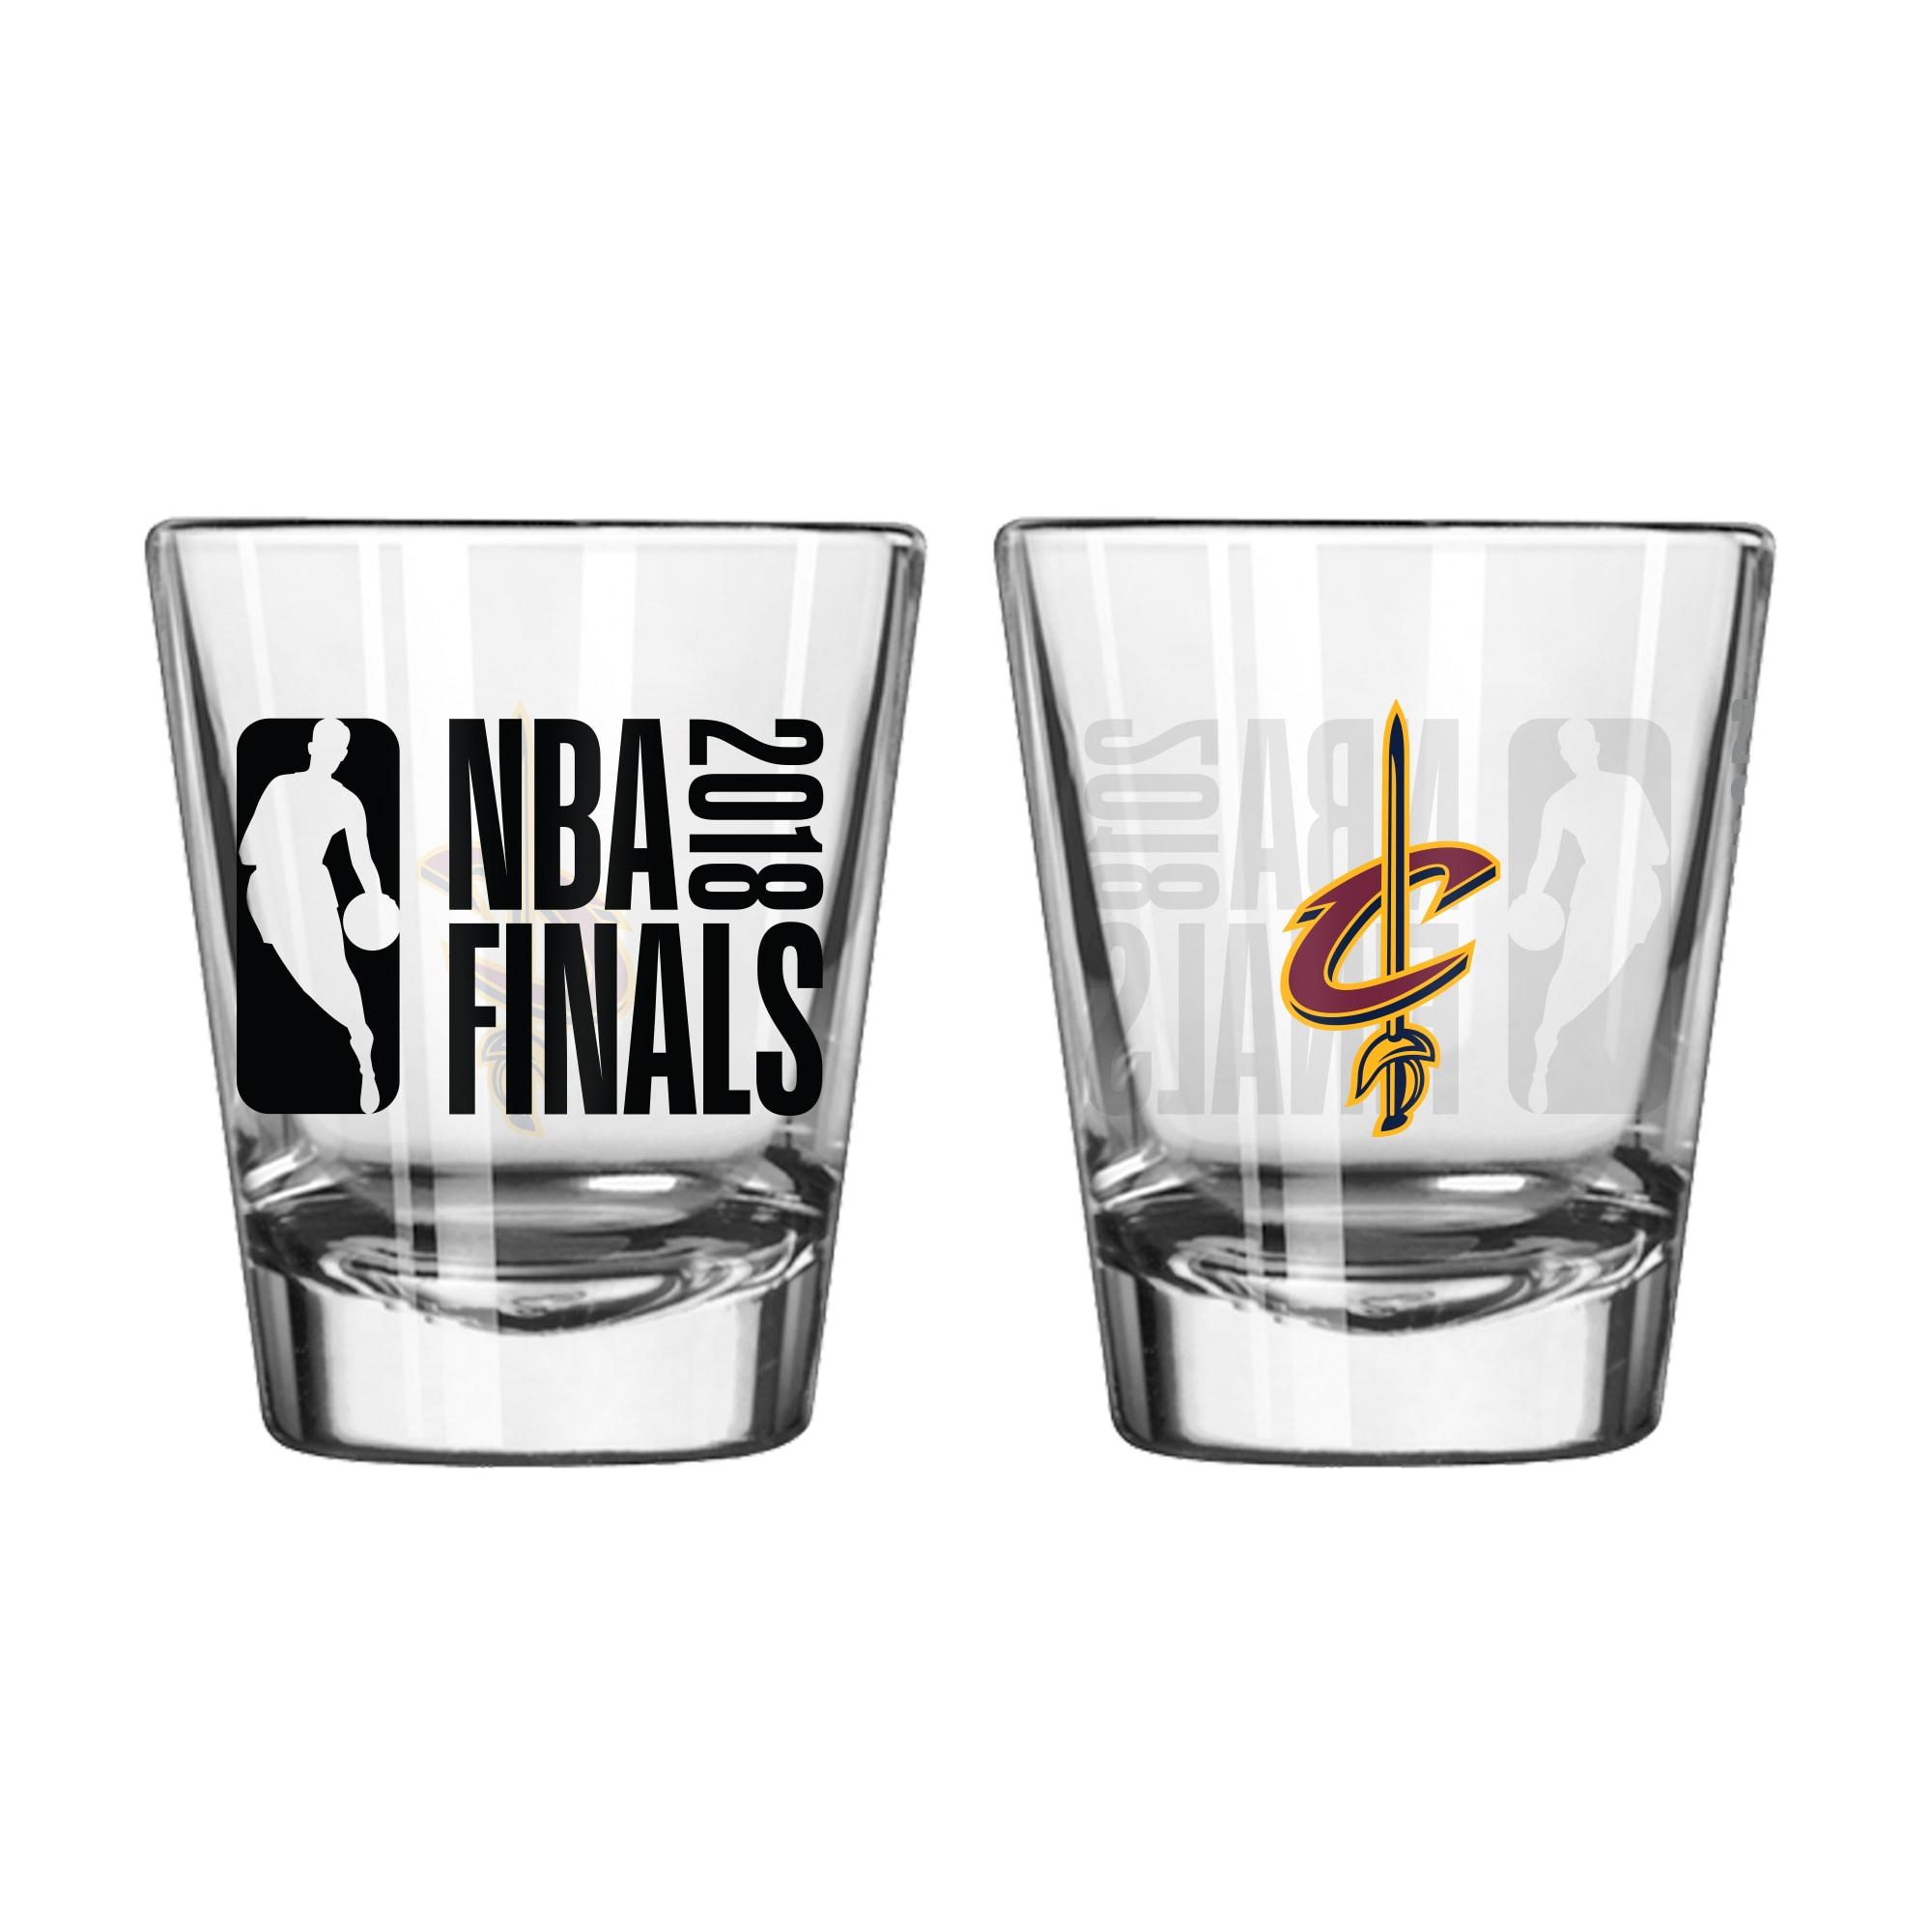 Cleveland Cavaliers 2018 NBA Finals Bound 2oz. Shot Glass